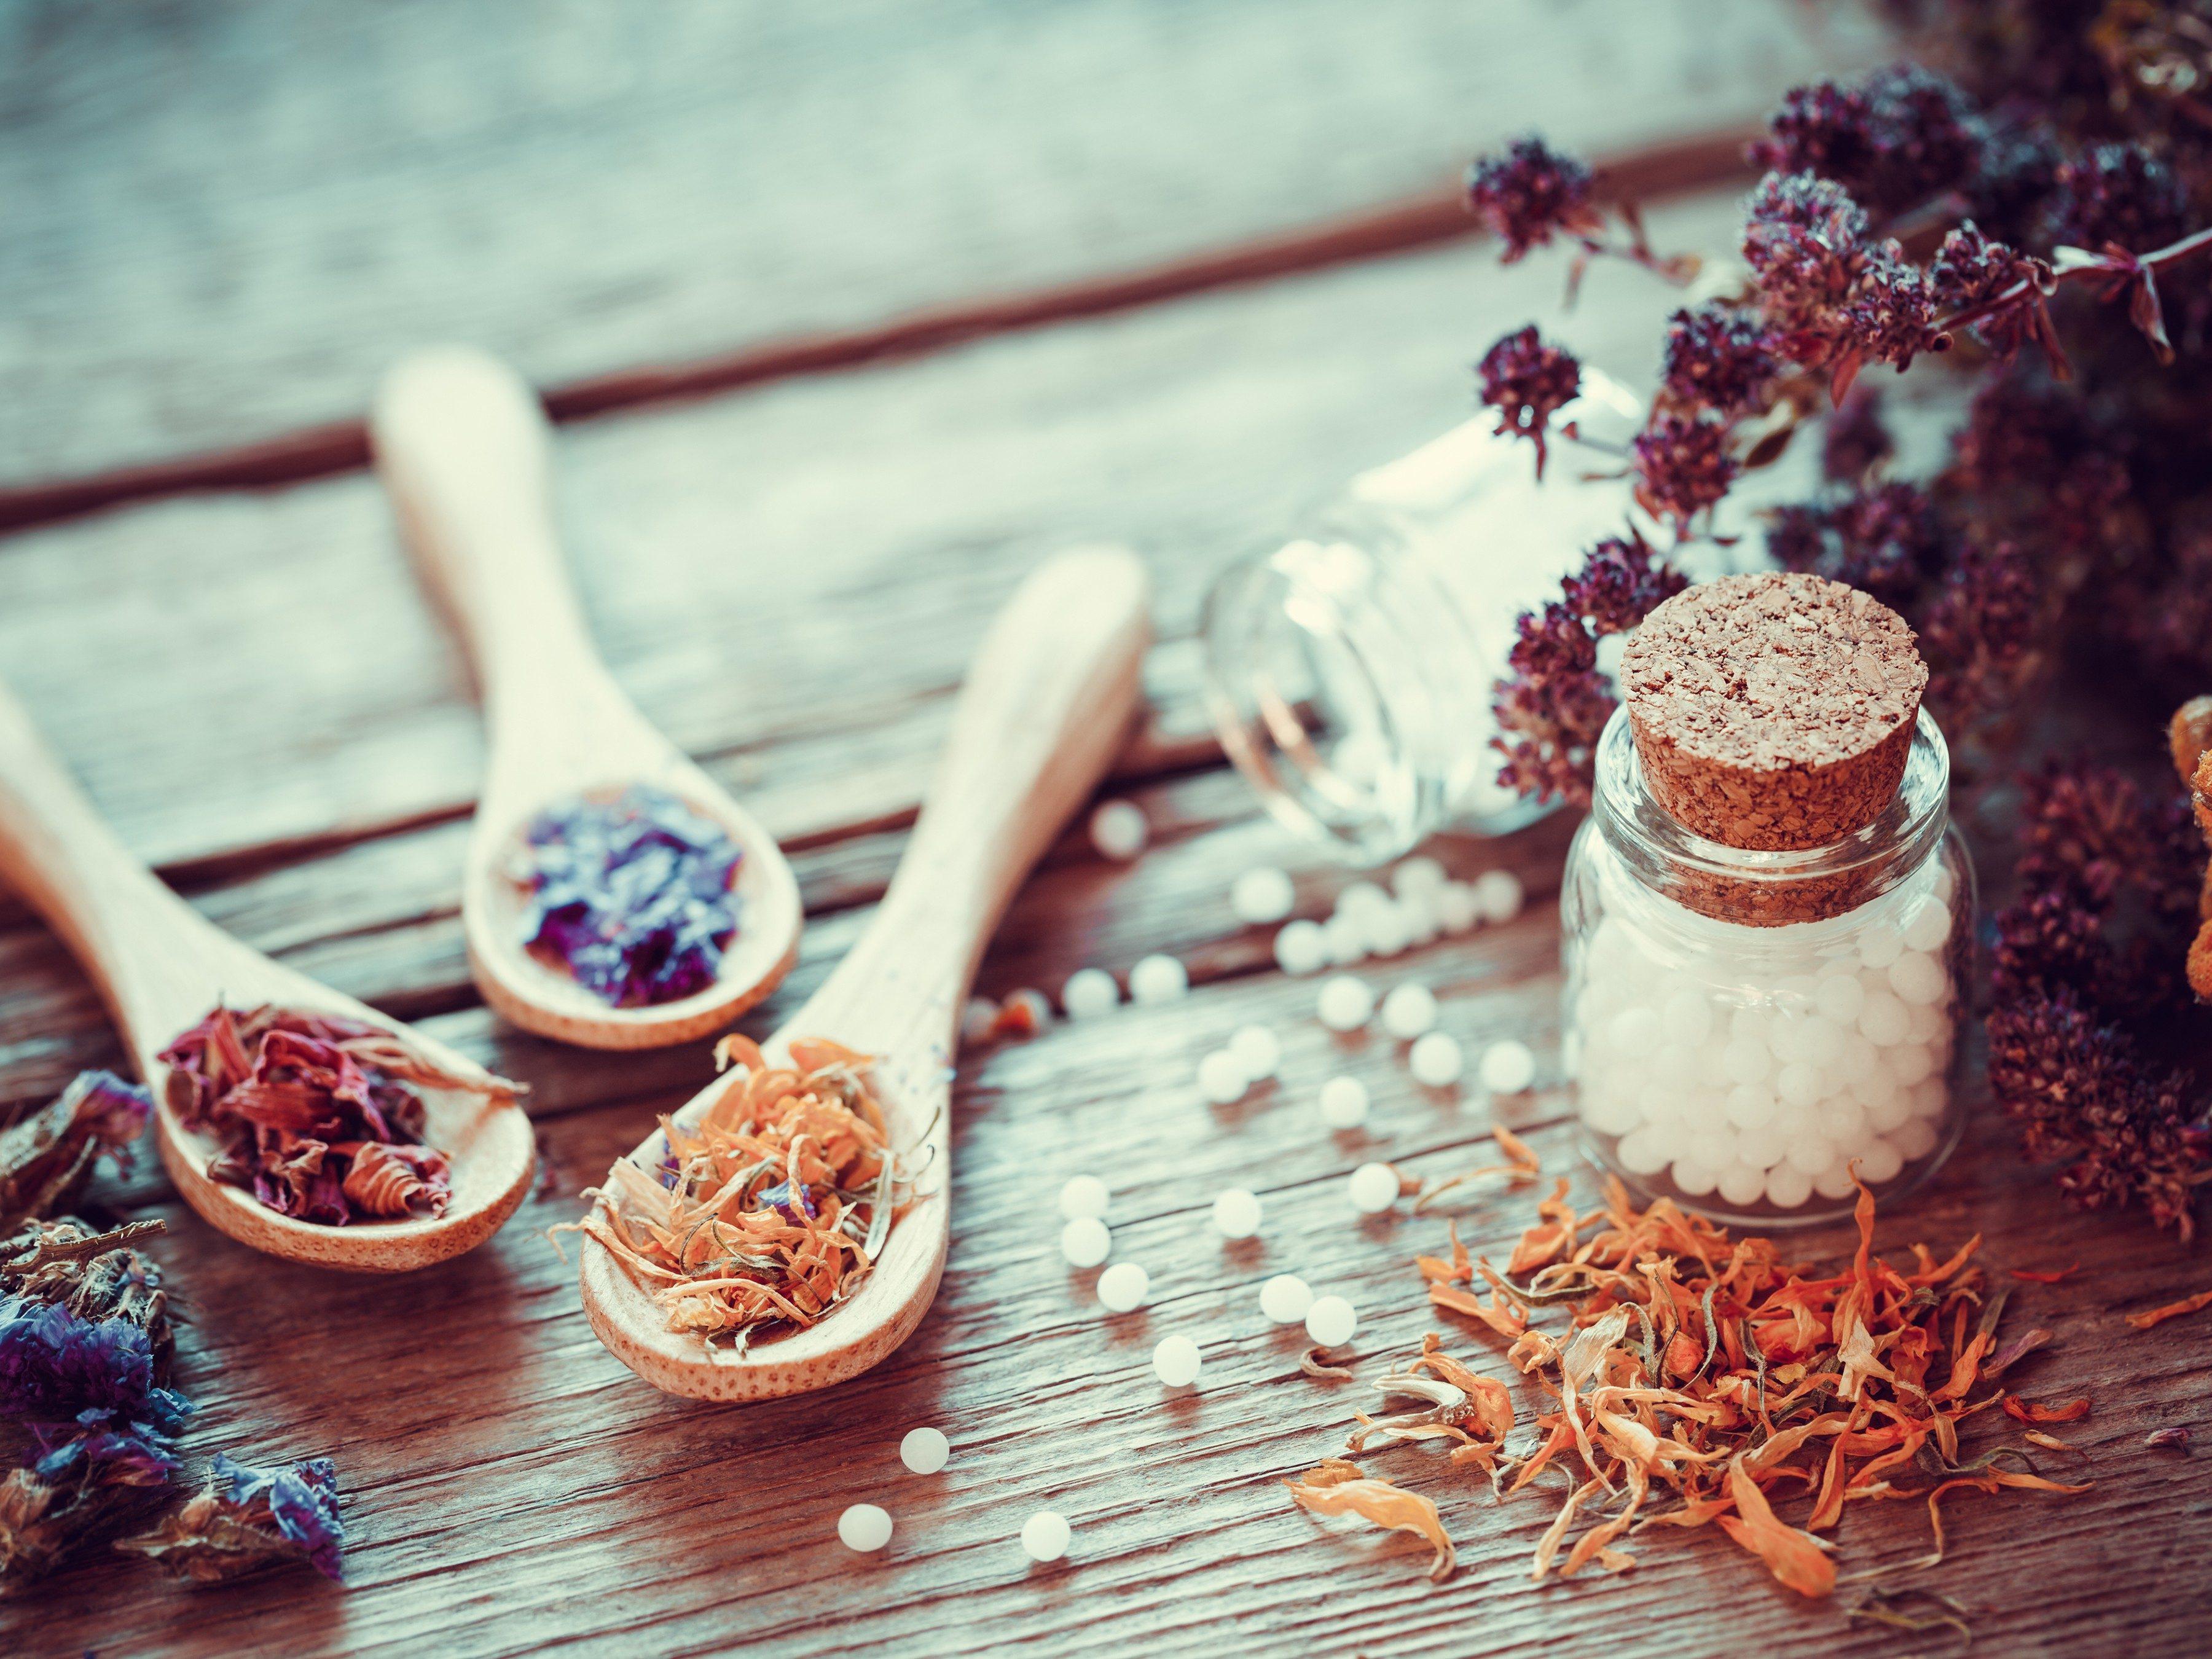 9. Homeopathy